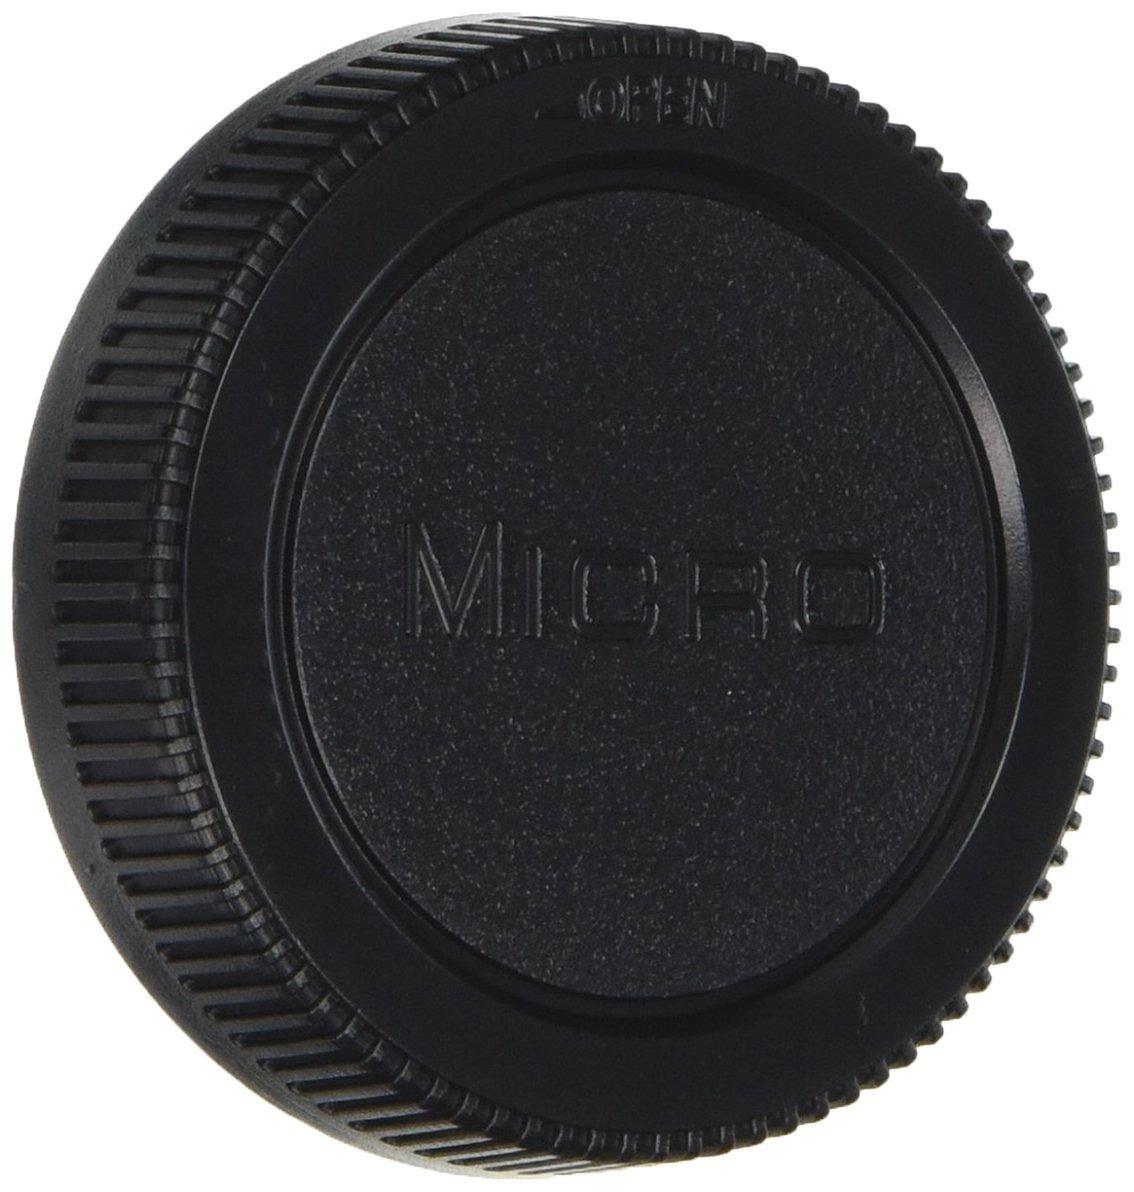 Fotodiox Cuerpo De La Cmara Tapa Para Nikon D1 D1h D1x D Cargando Zoom